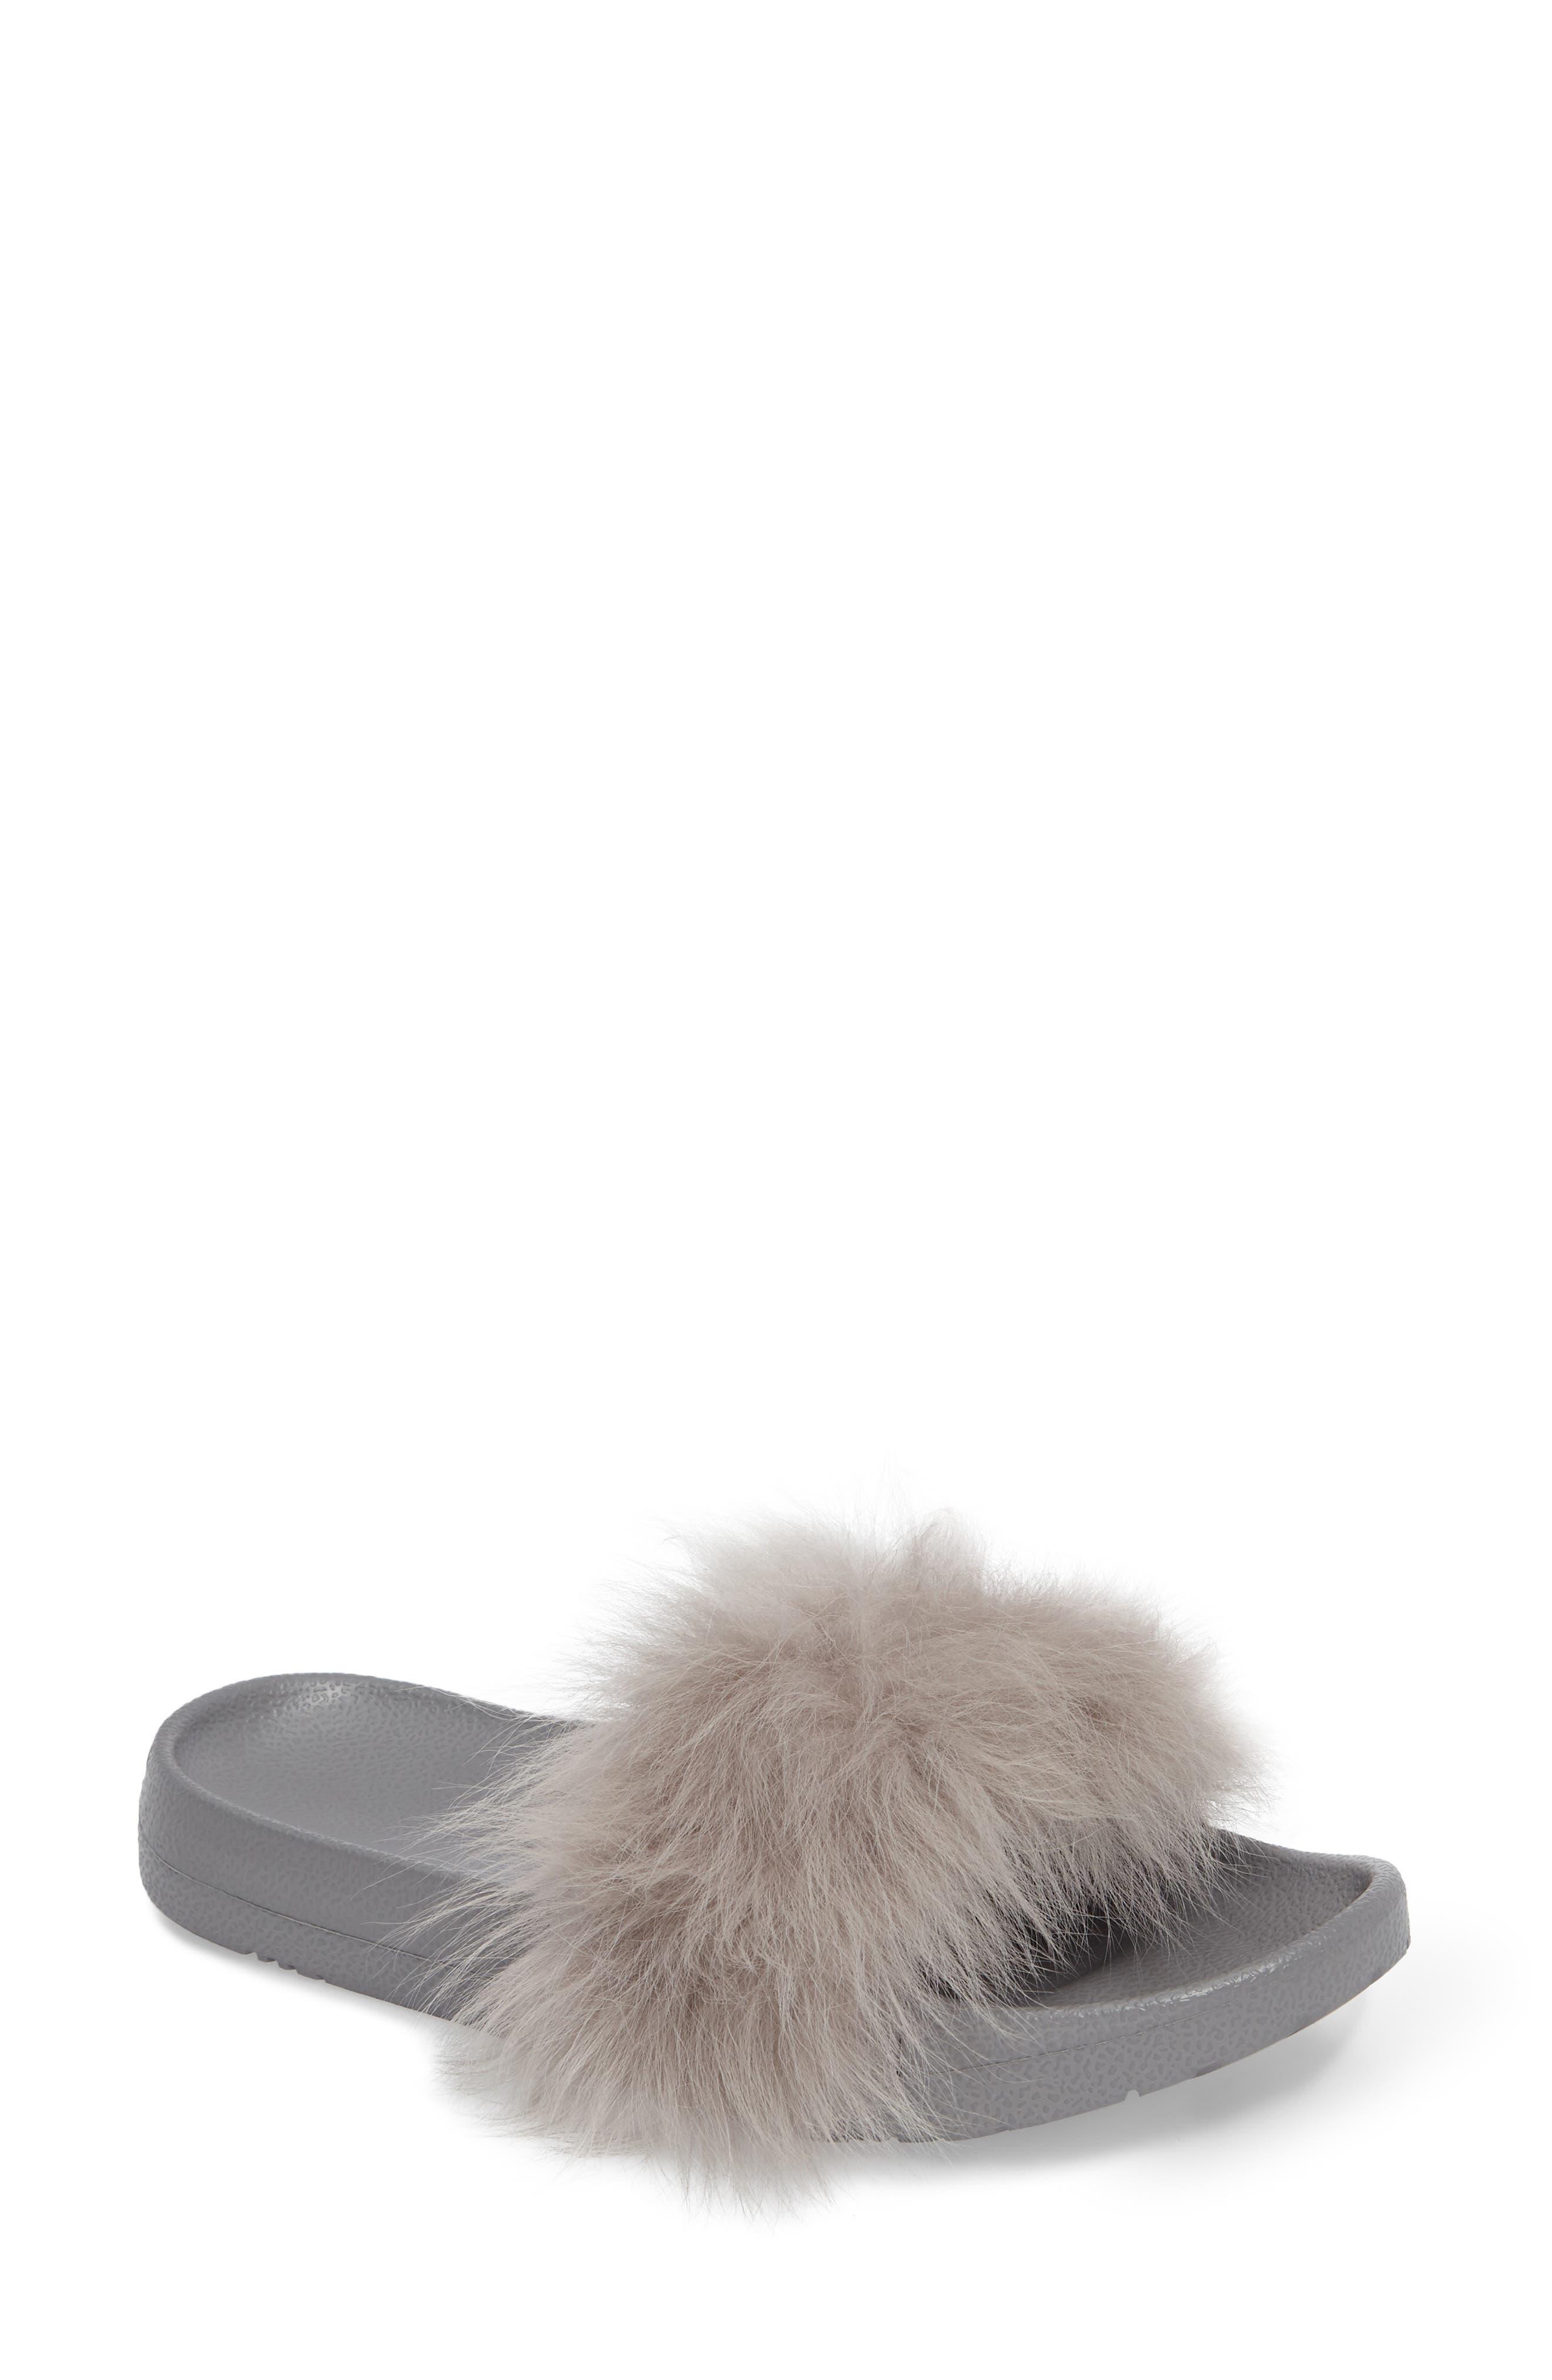 Royale Genuine Shearling Slide Sandal,                         Main,                         color, Seal